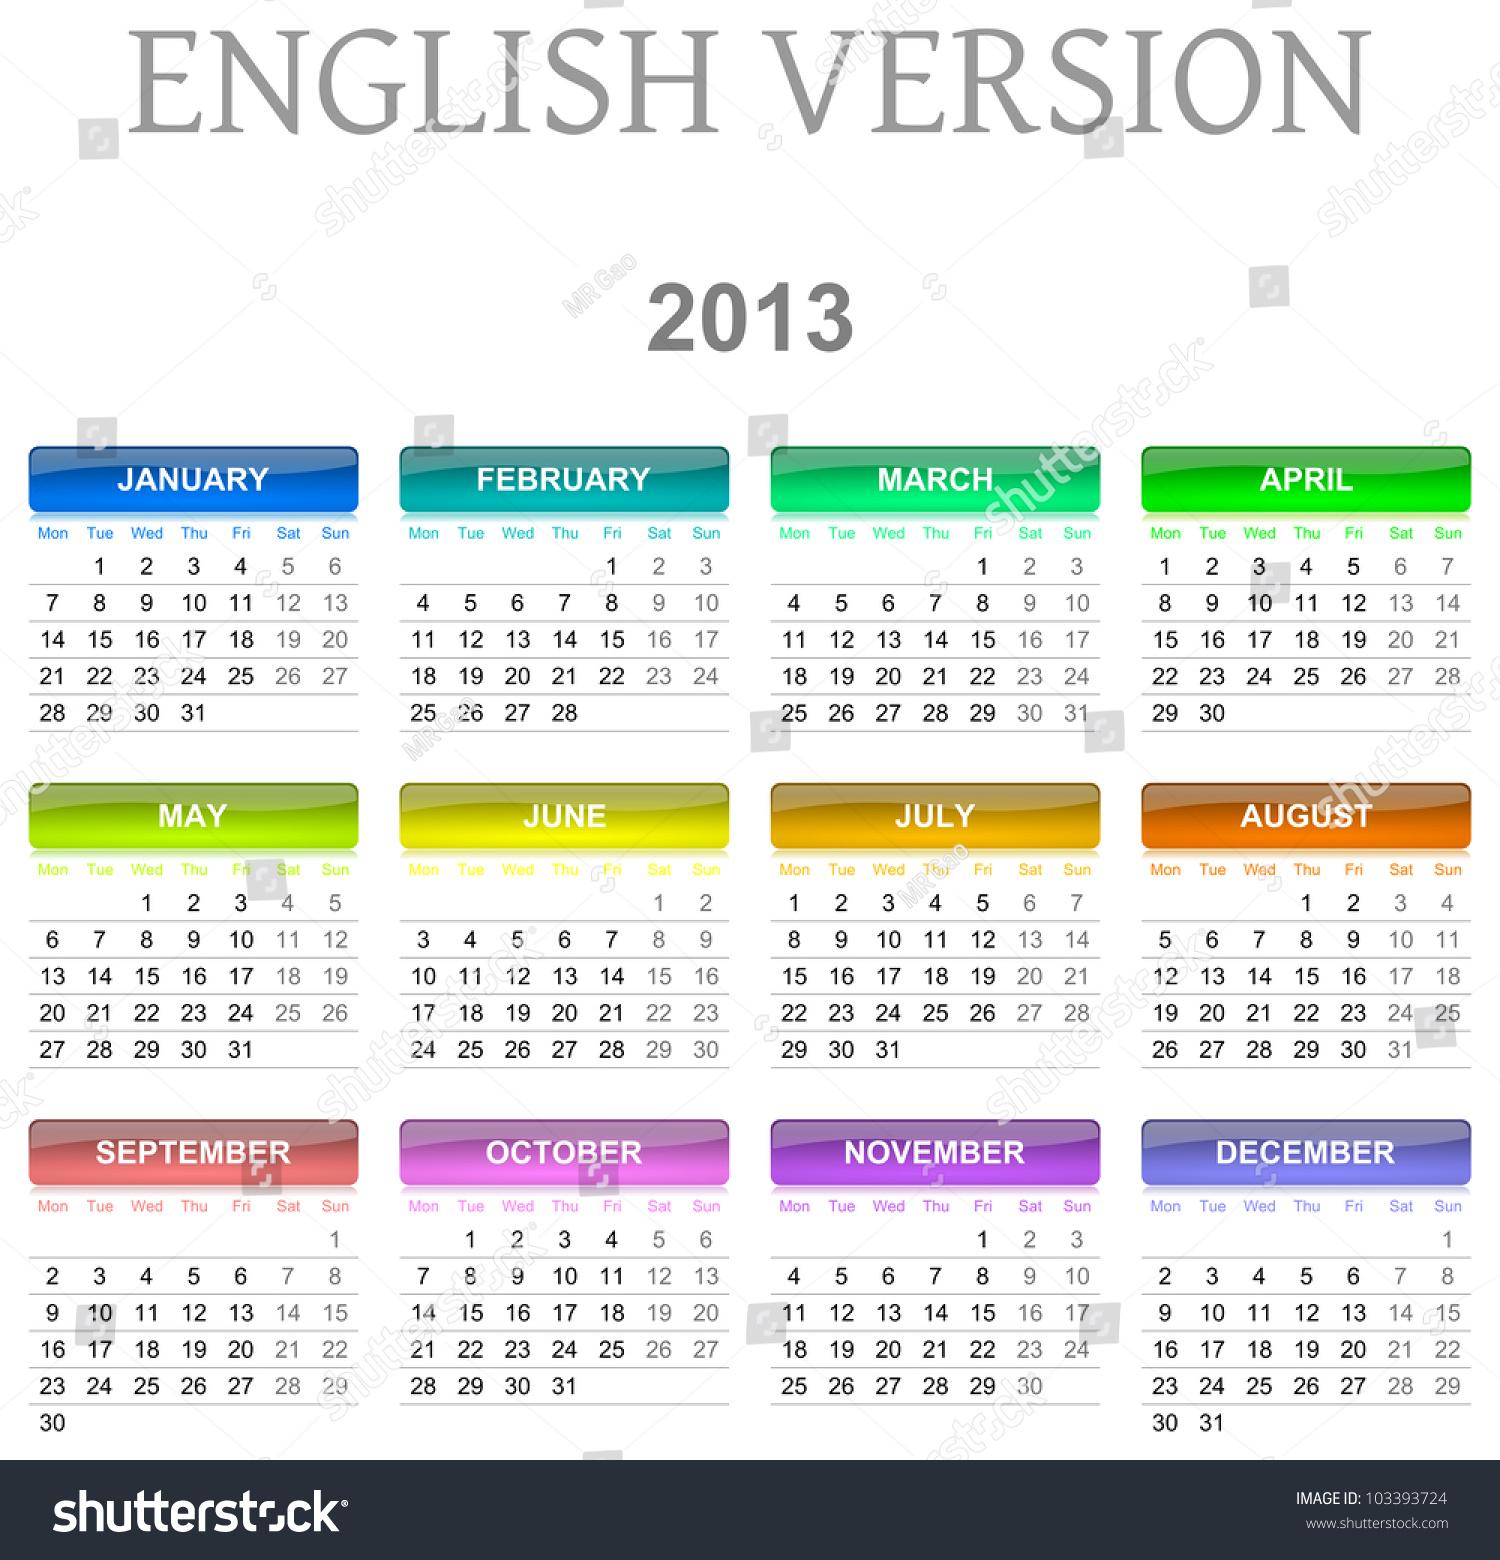 Calendar Illustration Search : Colorful monday to sunday calendar english version